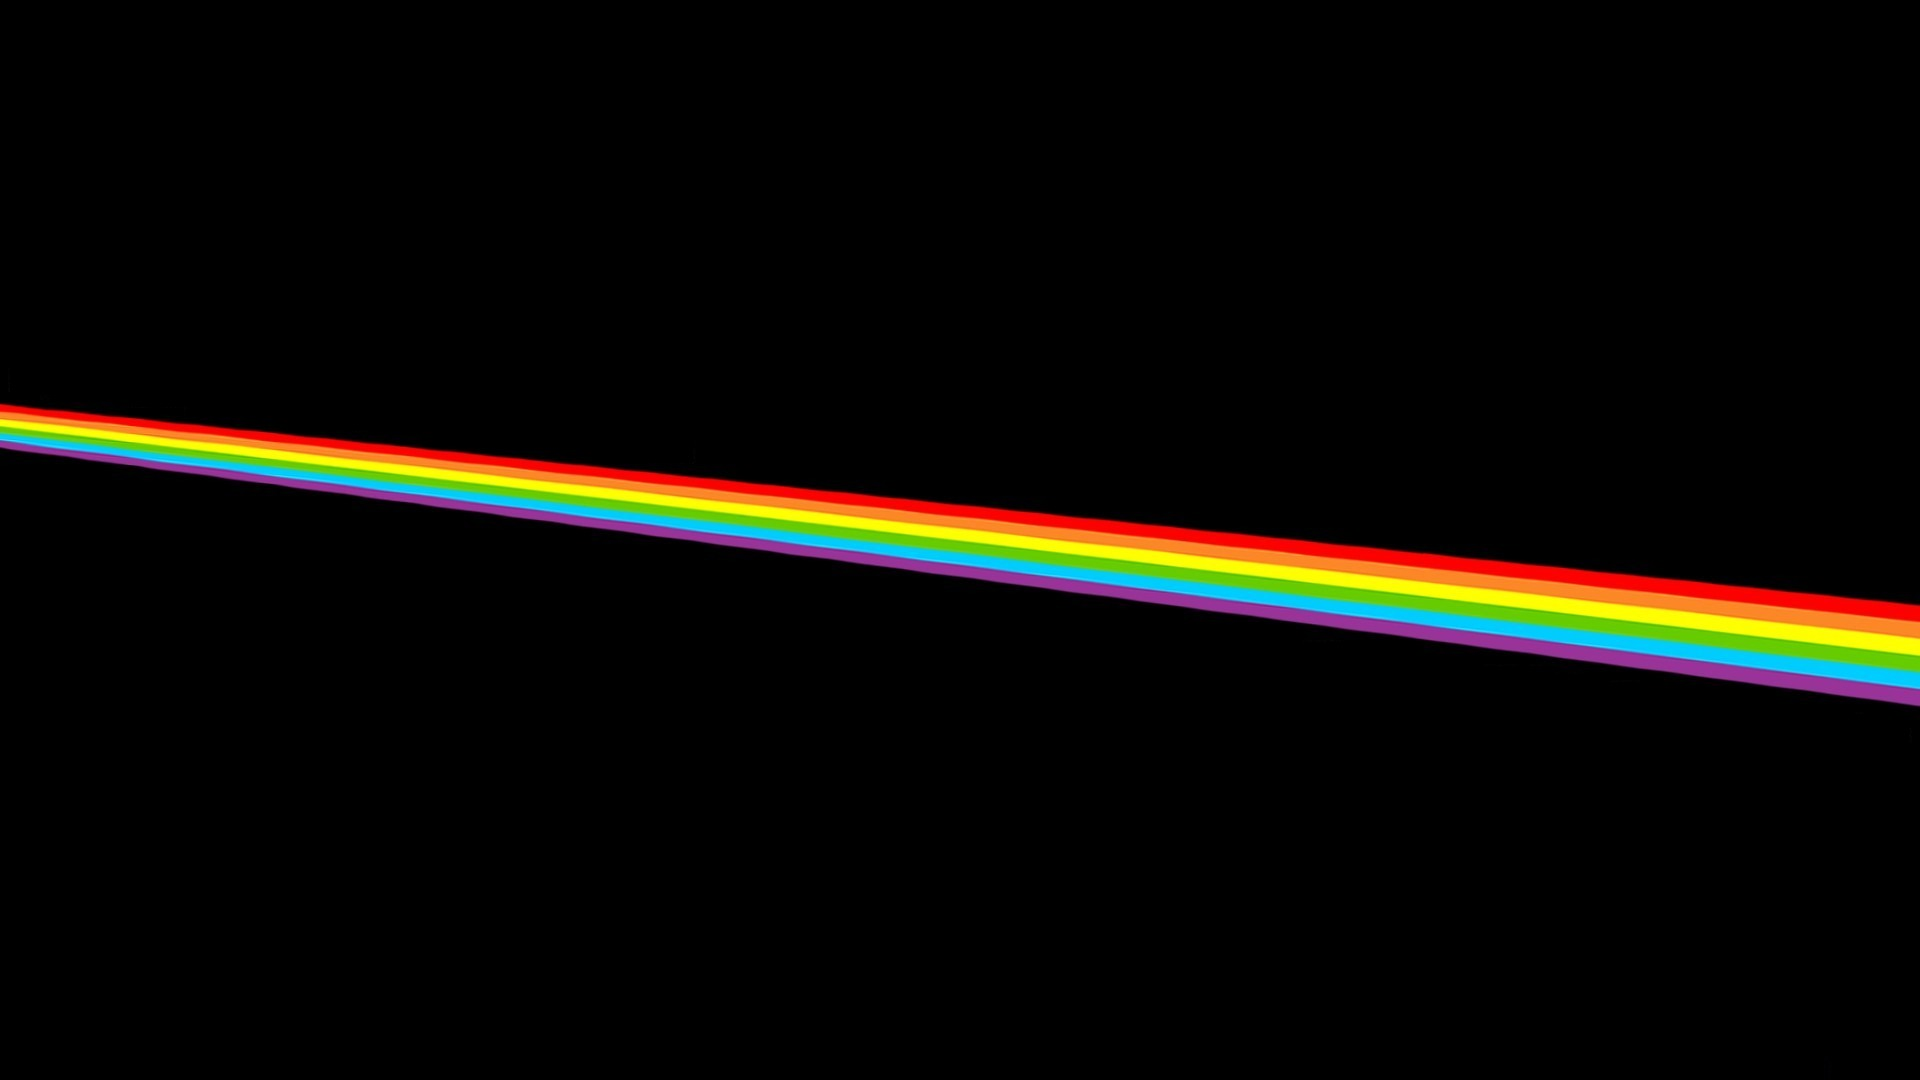 Download wallpaper color music the moon rainbow Pink Dark 1920x1080